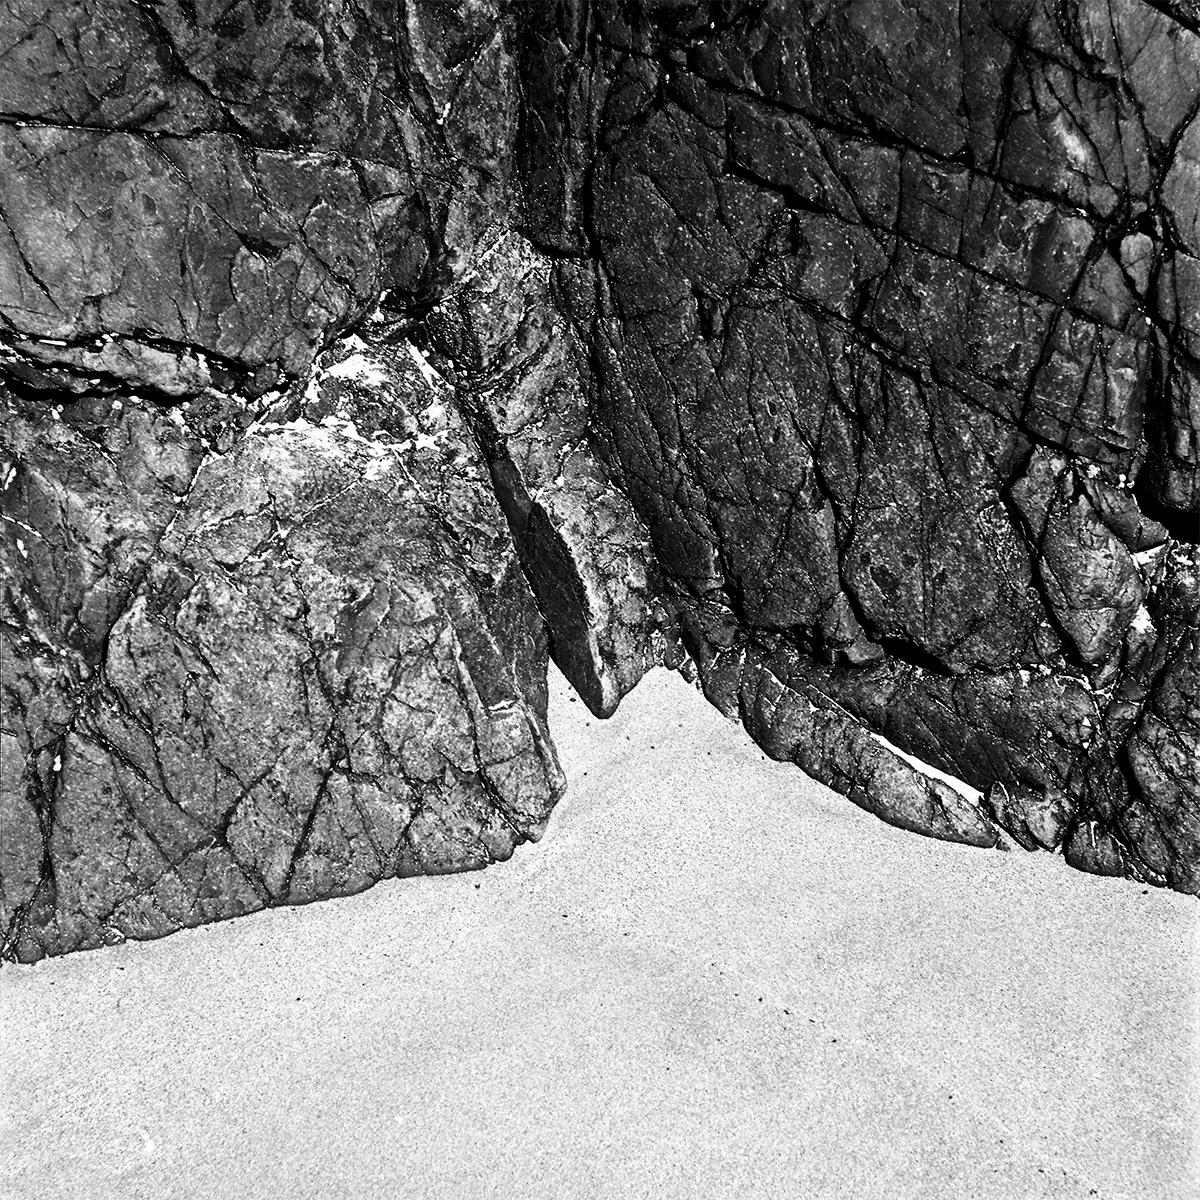 Rocks on brittany's beach by Emmanuel Pineau